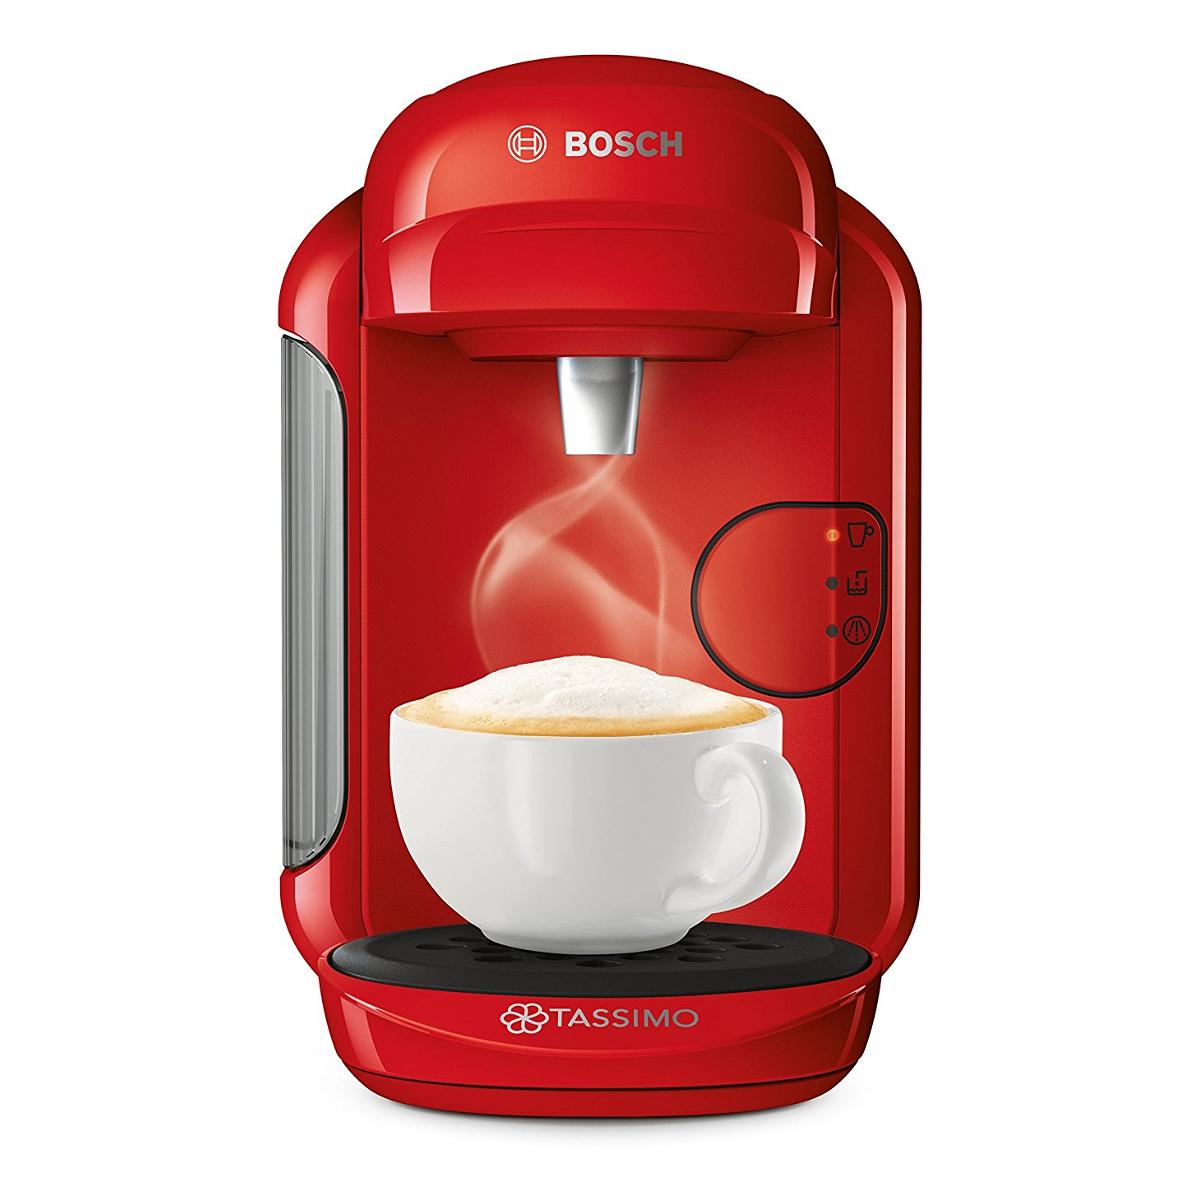 Tassimo Coffee Maker Red Light Stays : Bosch TAS1403GB Tassimo by Bosch Vivy 2 Coffee Machine in Red Hughes